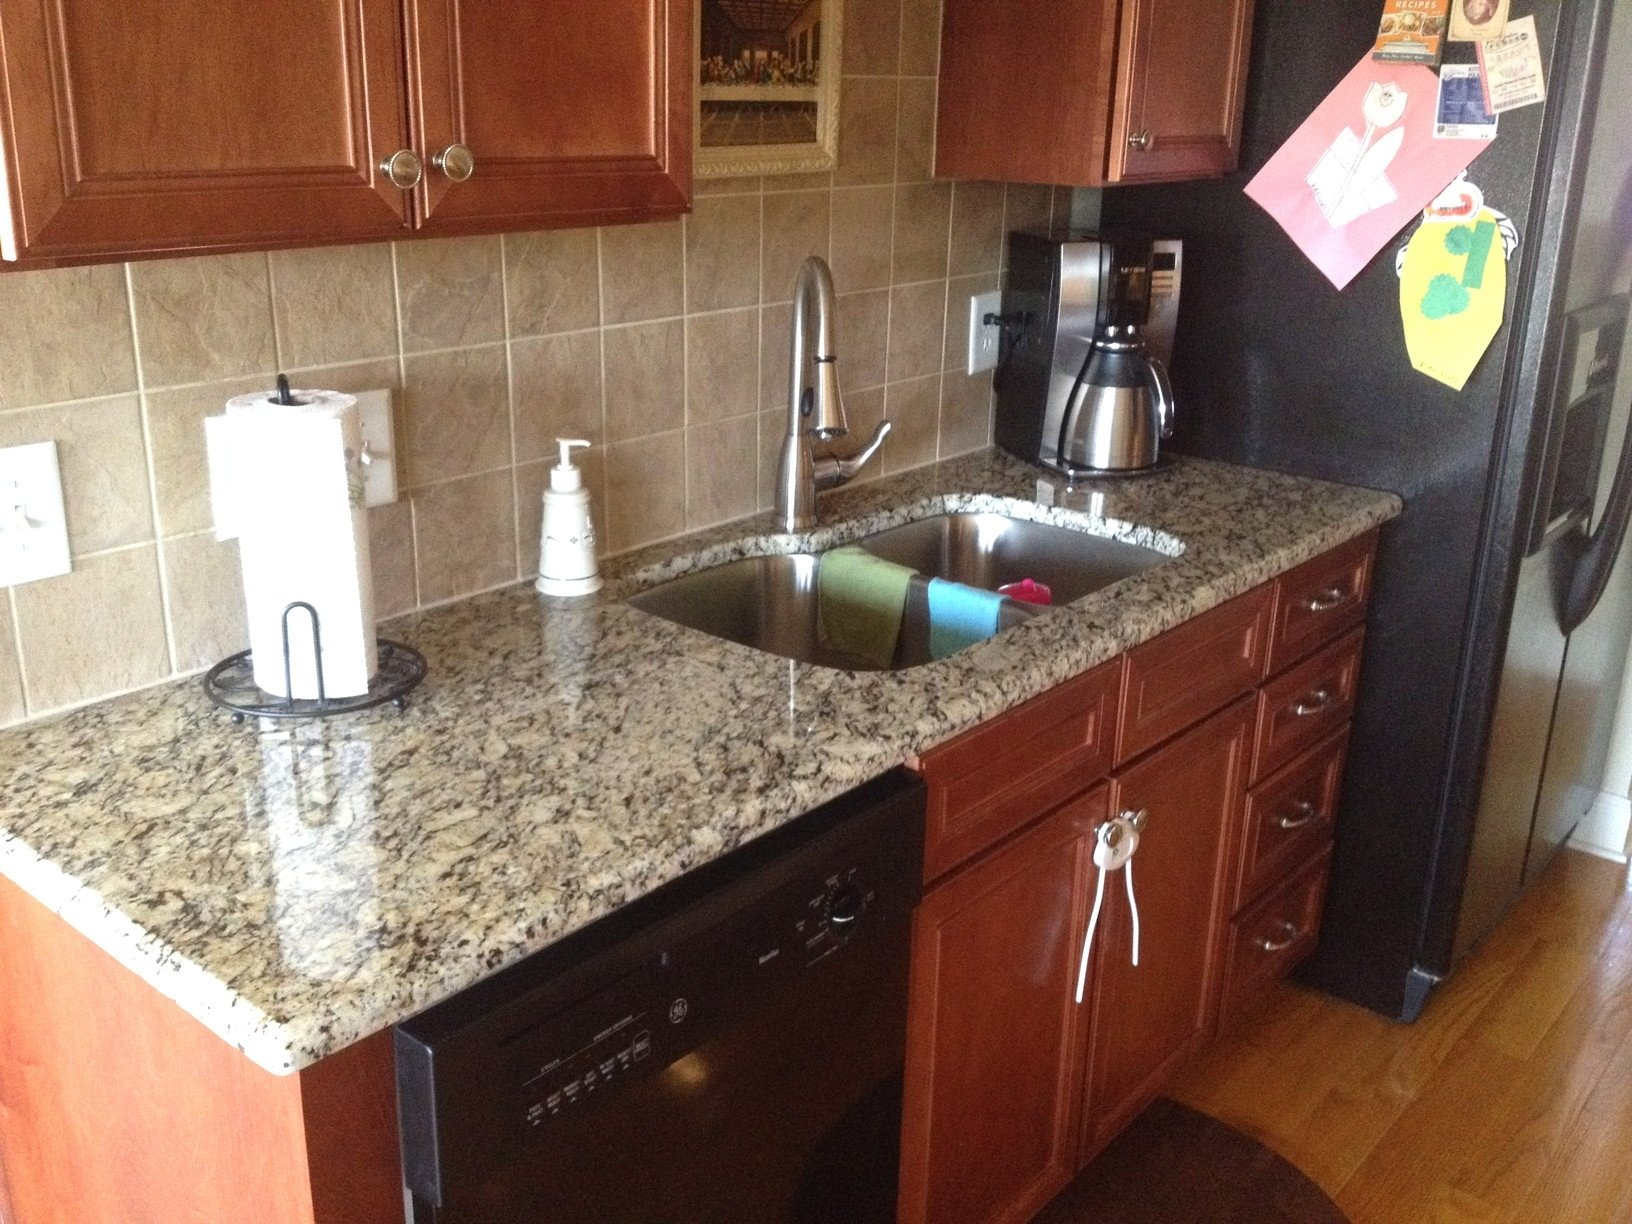 10 Amazing New Venetian Gold Granite Backsplash Ideas kitchen granite countertops cityrock countertops inc raleigh nc 2021